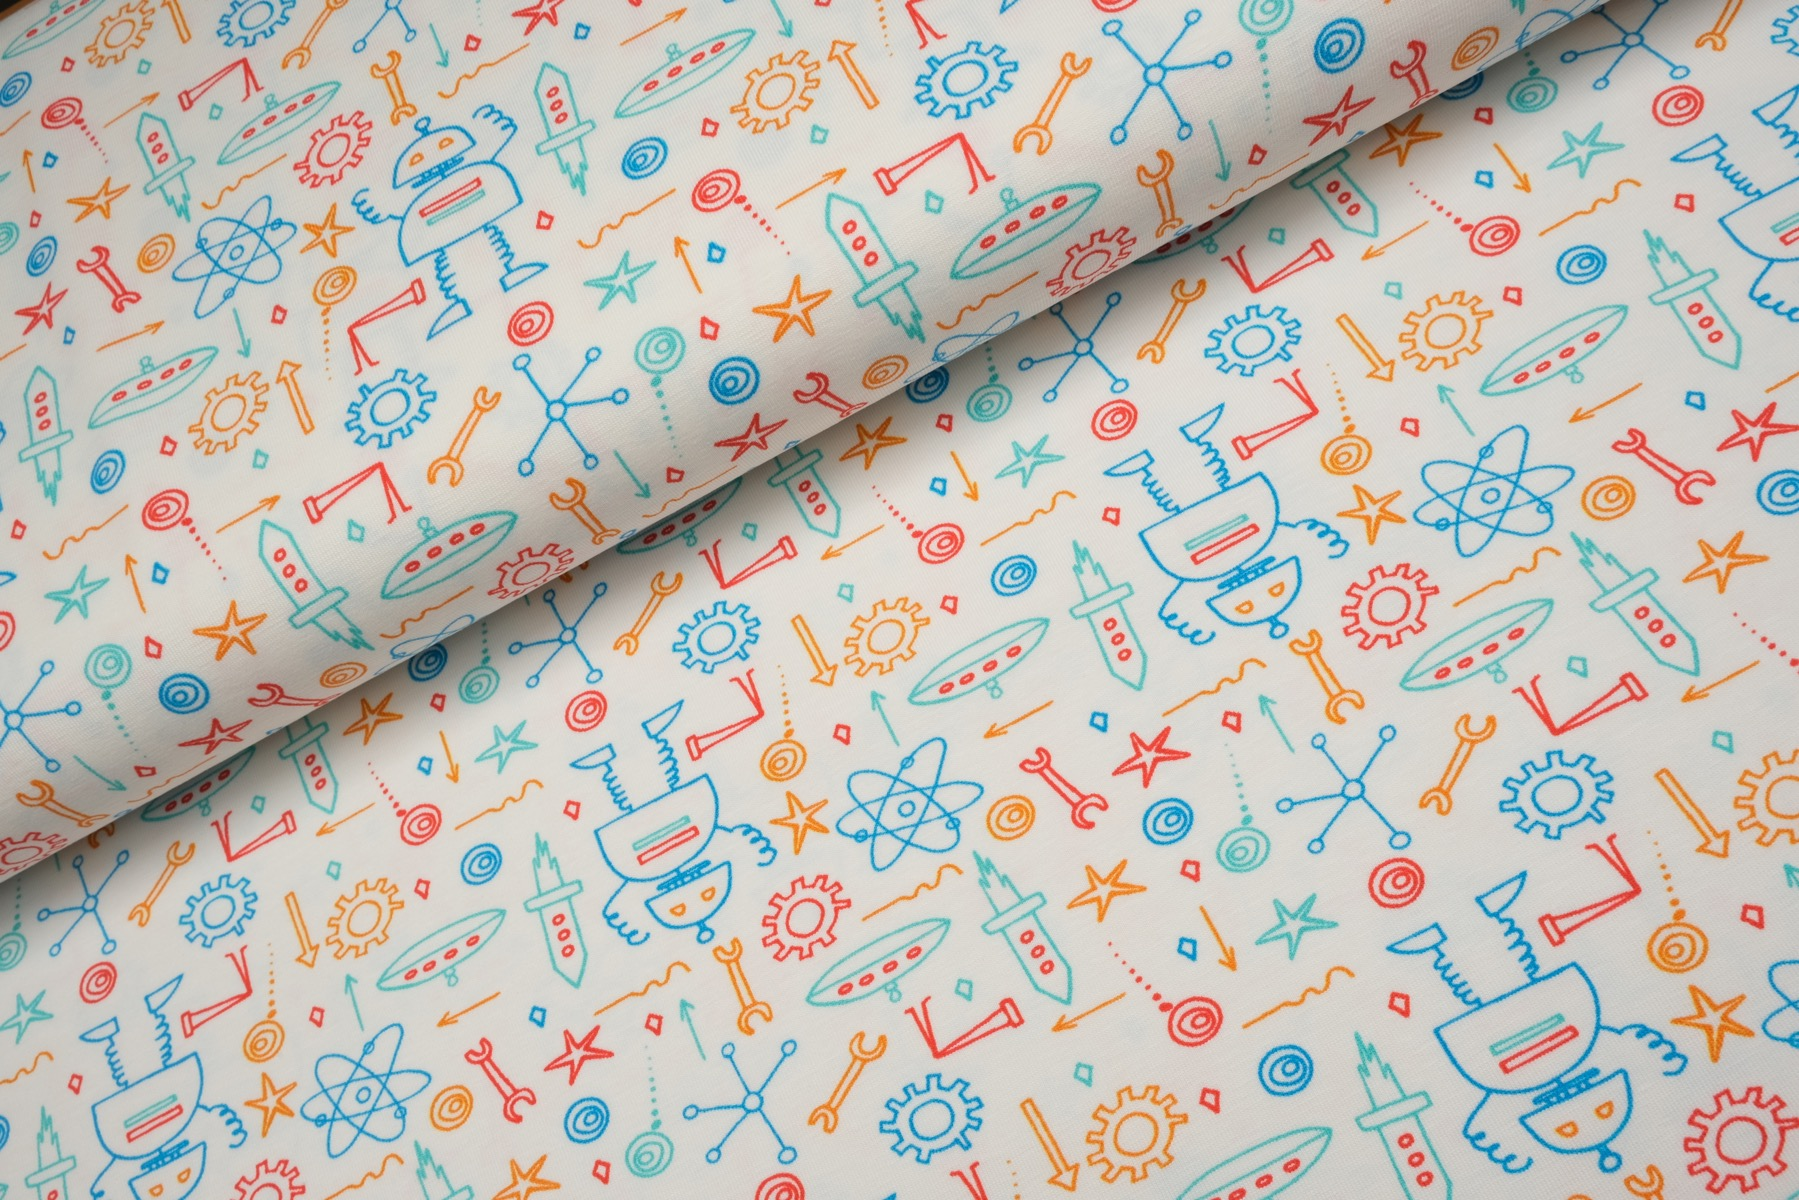 Robot Fun Tricot Wit - Megan Blue Fabrics